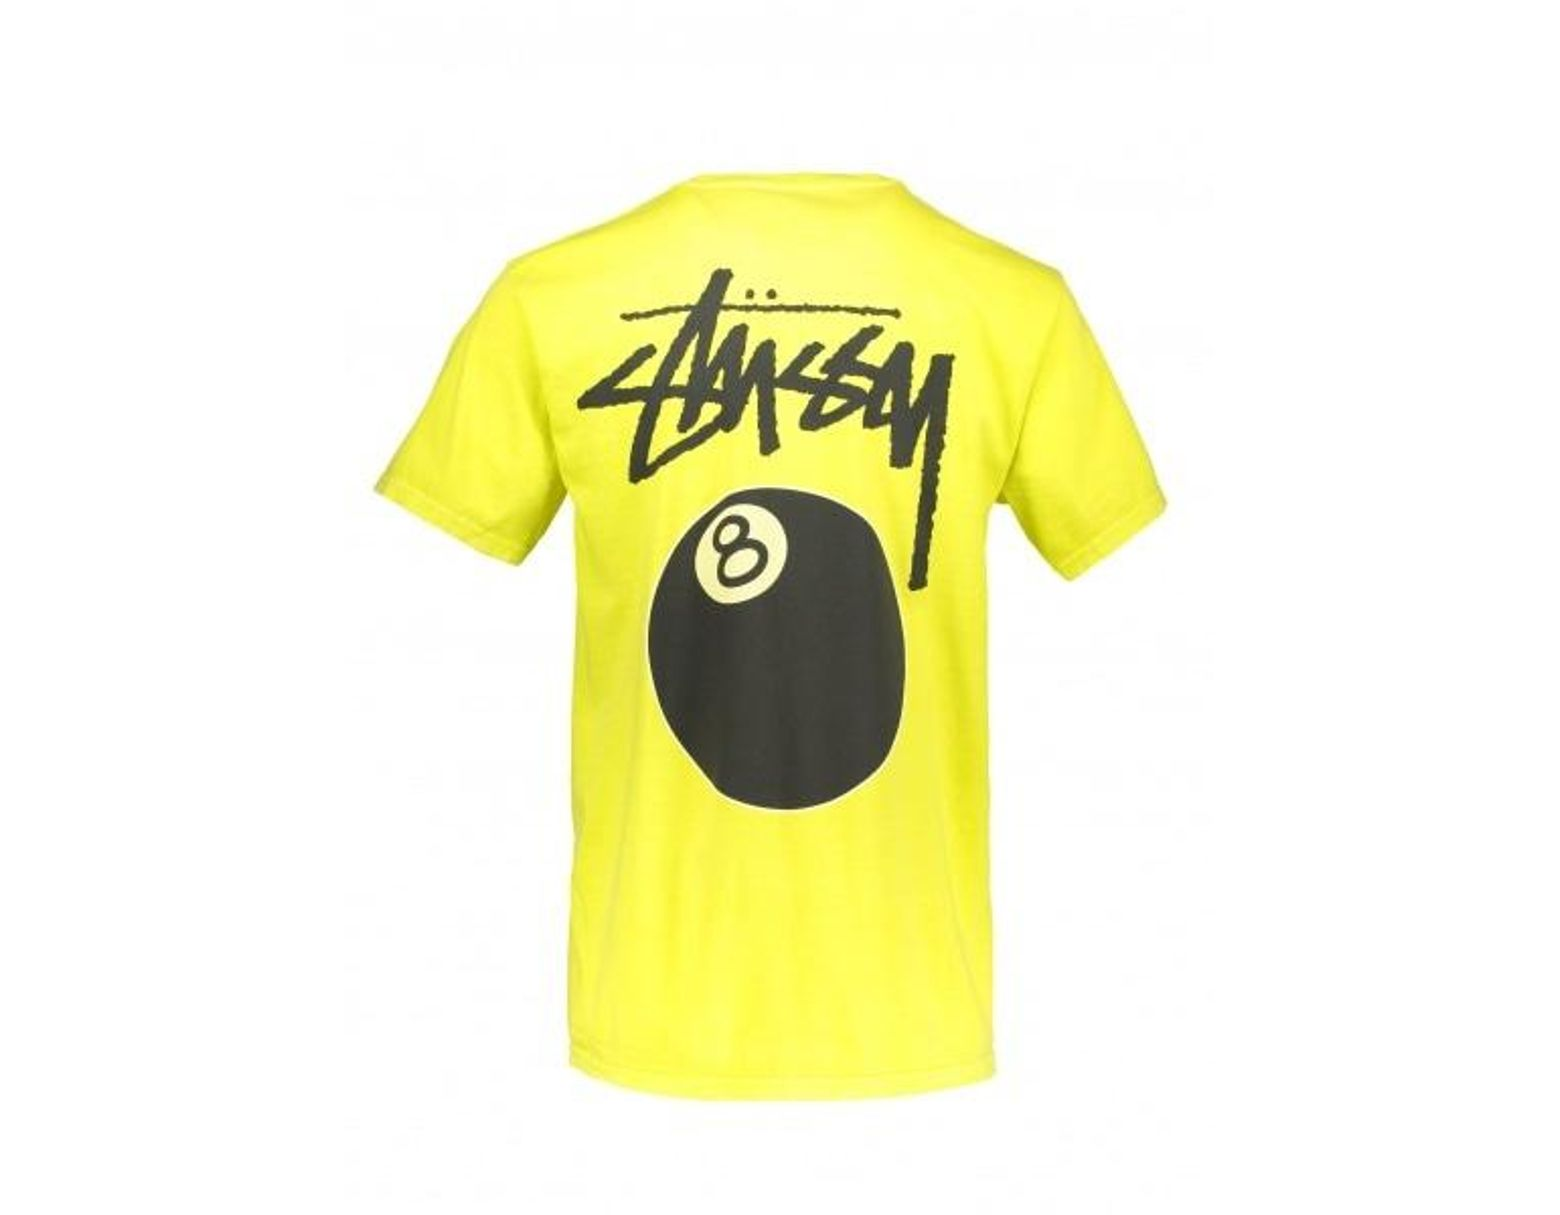 d3ea75766 Men's Yellow 8 Ball Pig Dyed Tee